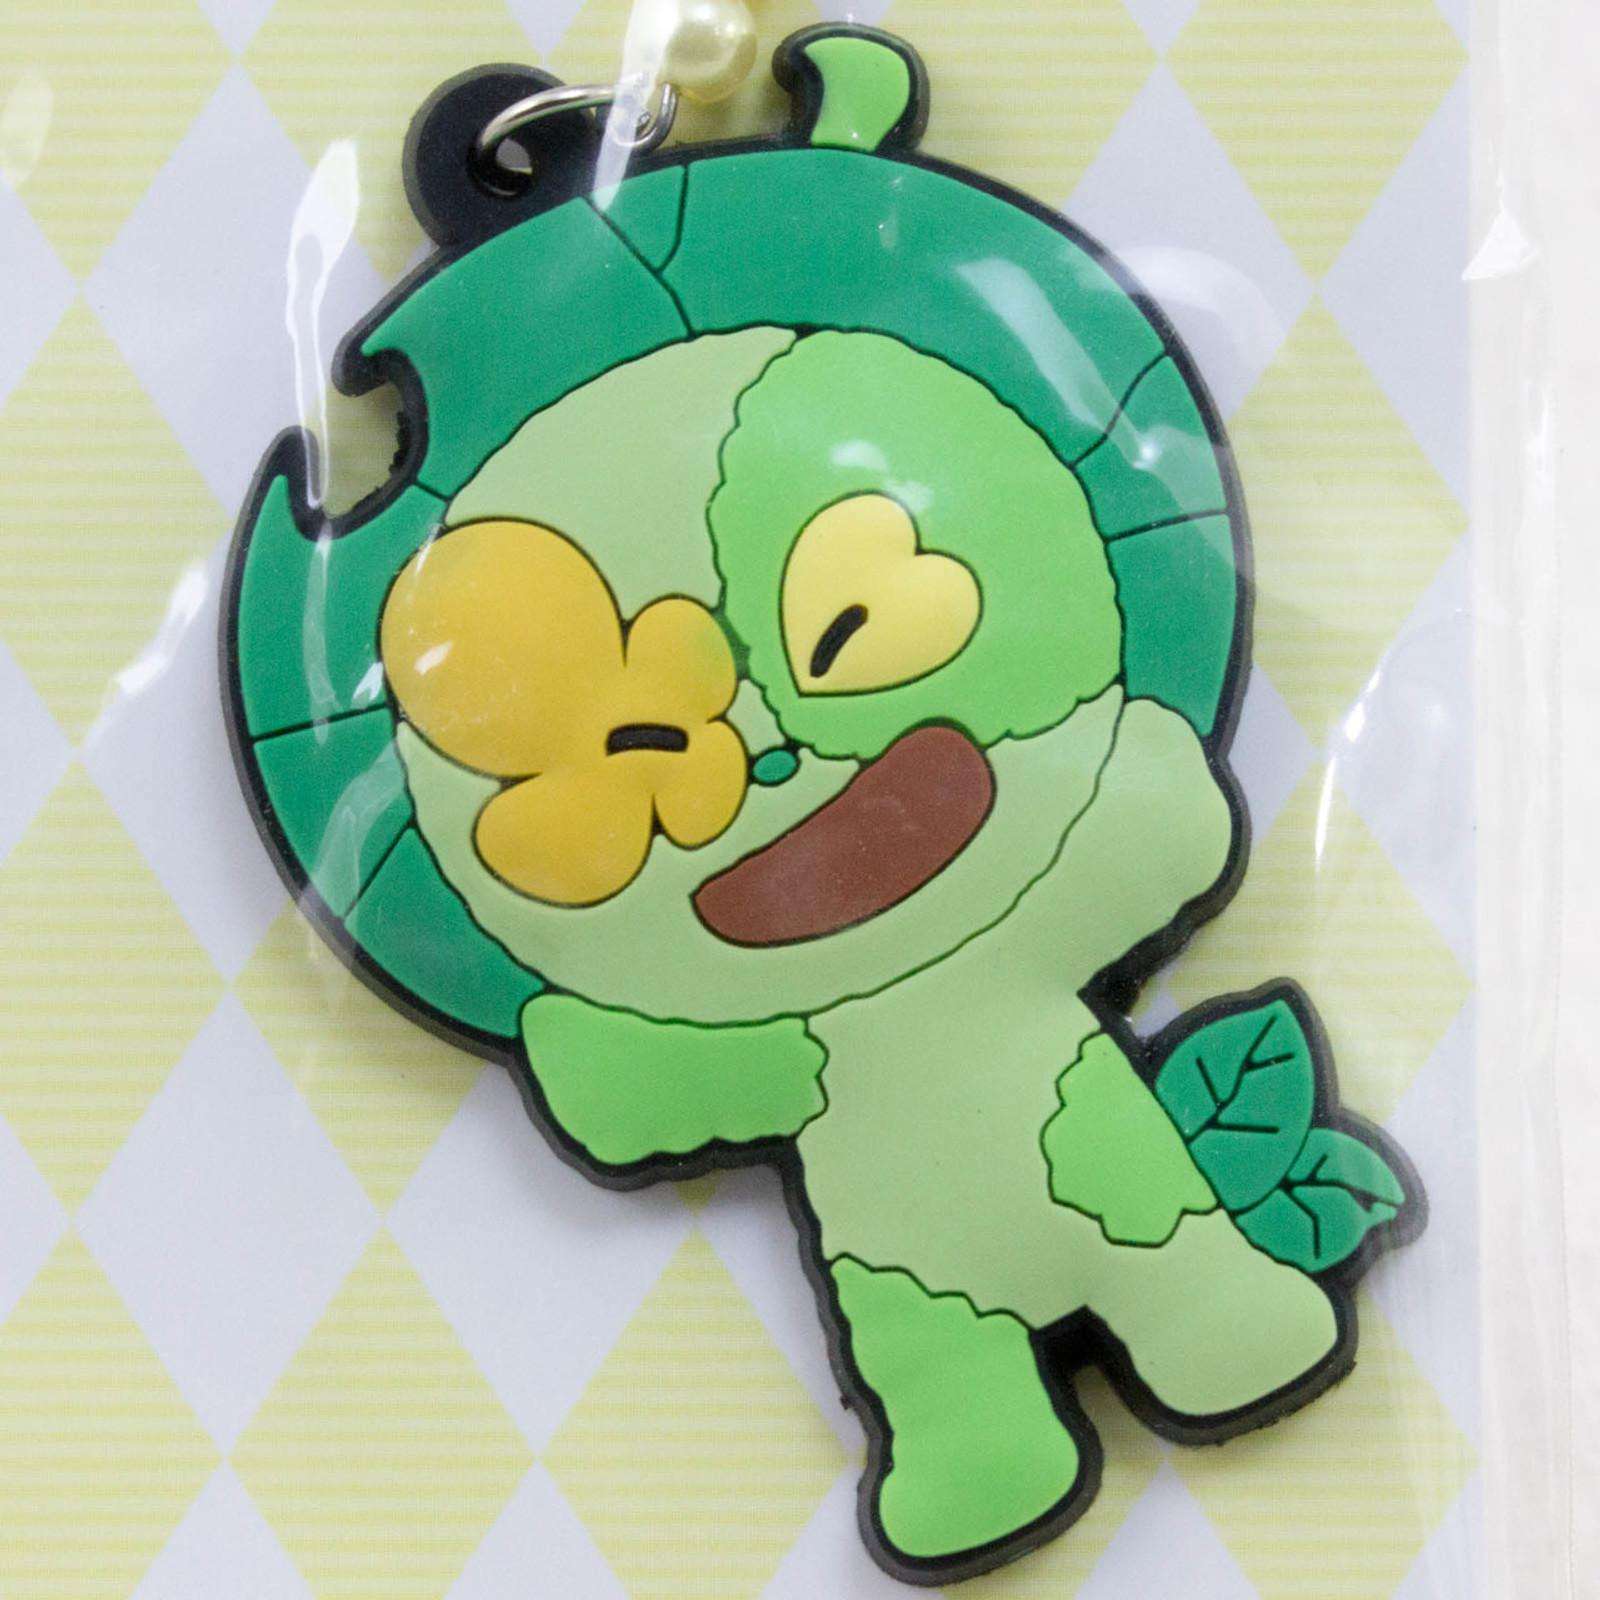 Blue Exorcist Ni chan Greenman Rubber Mascot Key Chian JAPAN ANIME MANGA